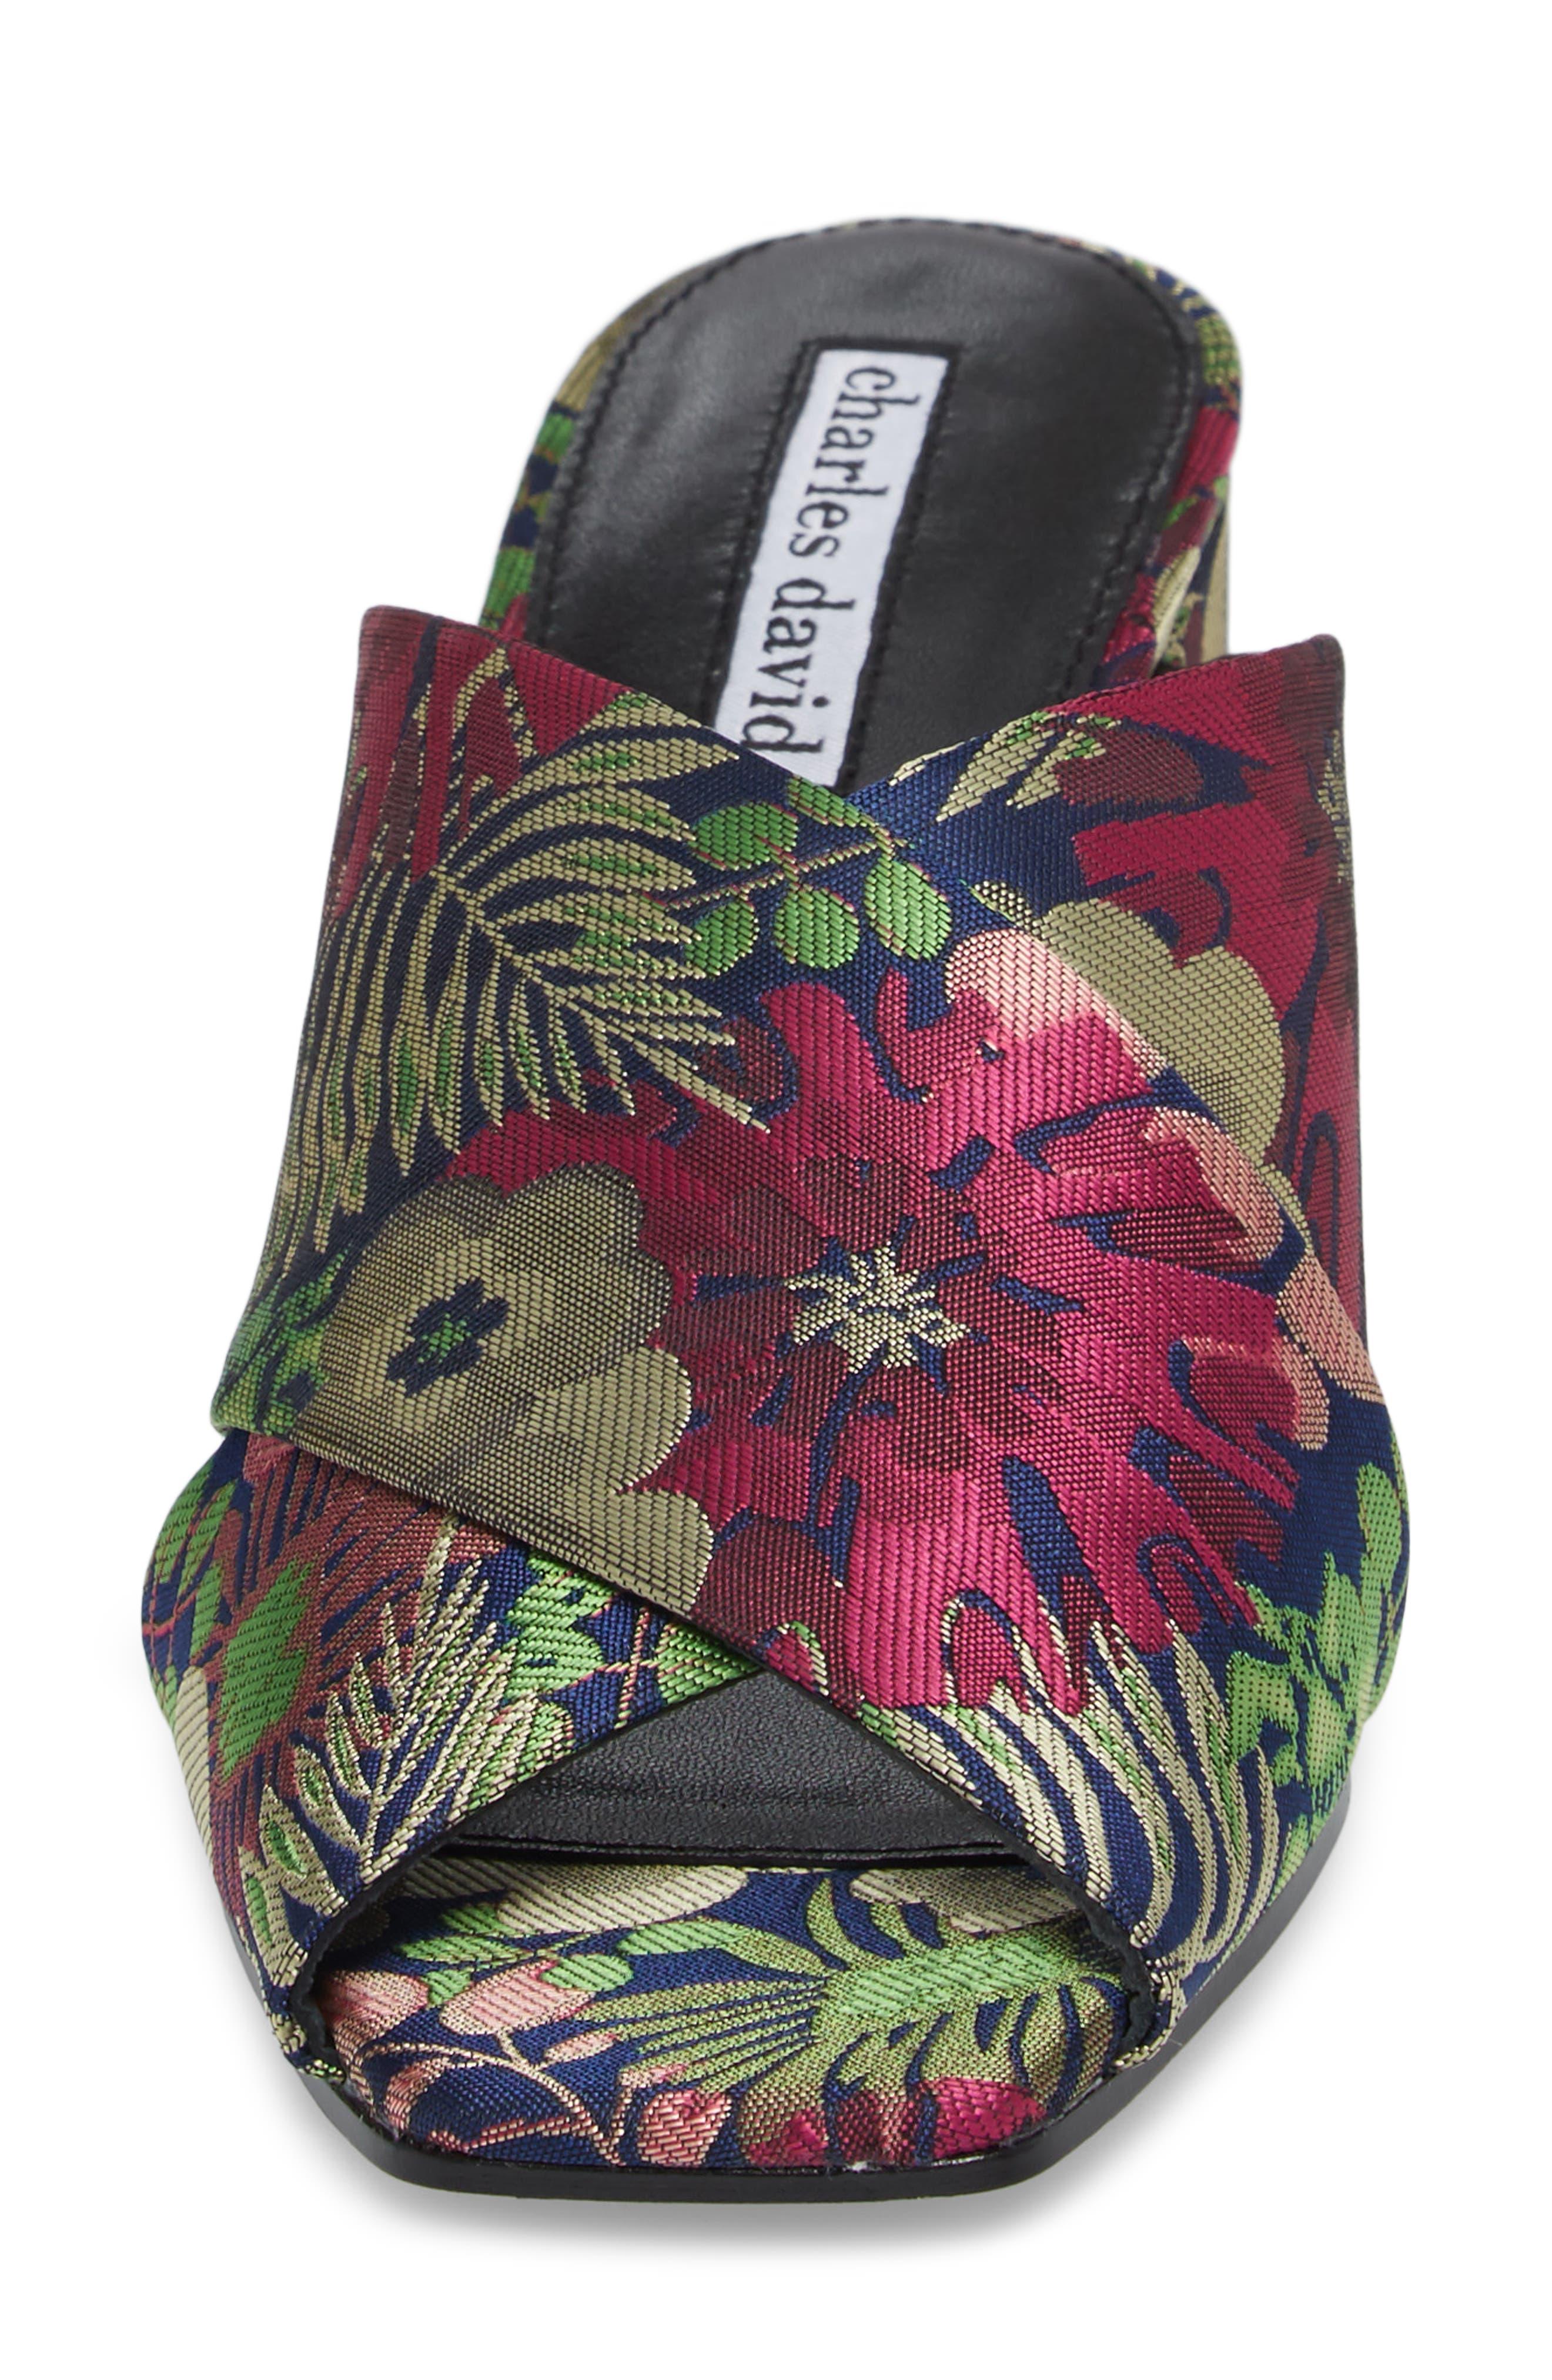 Crissaly Slide Sandal,                             Alternate thumbnail 4, color,                             GREEN MULTI FLORAL FABRIC